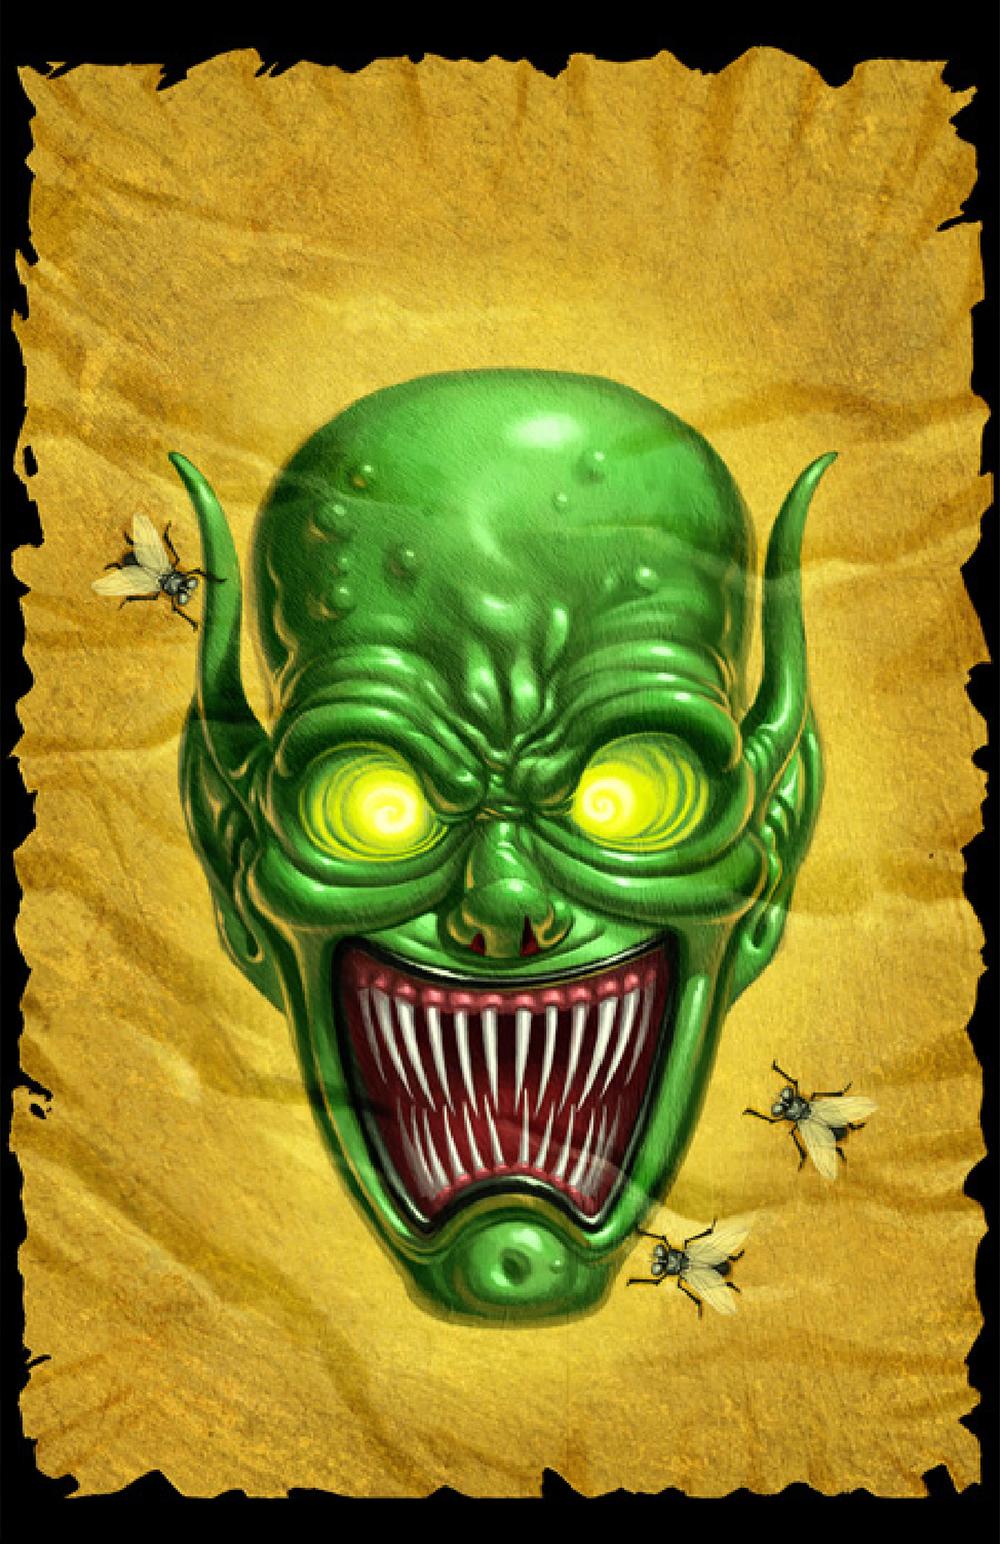 Mask Games For Kids